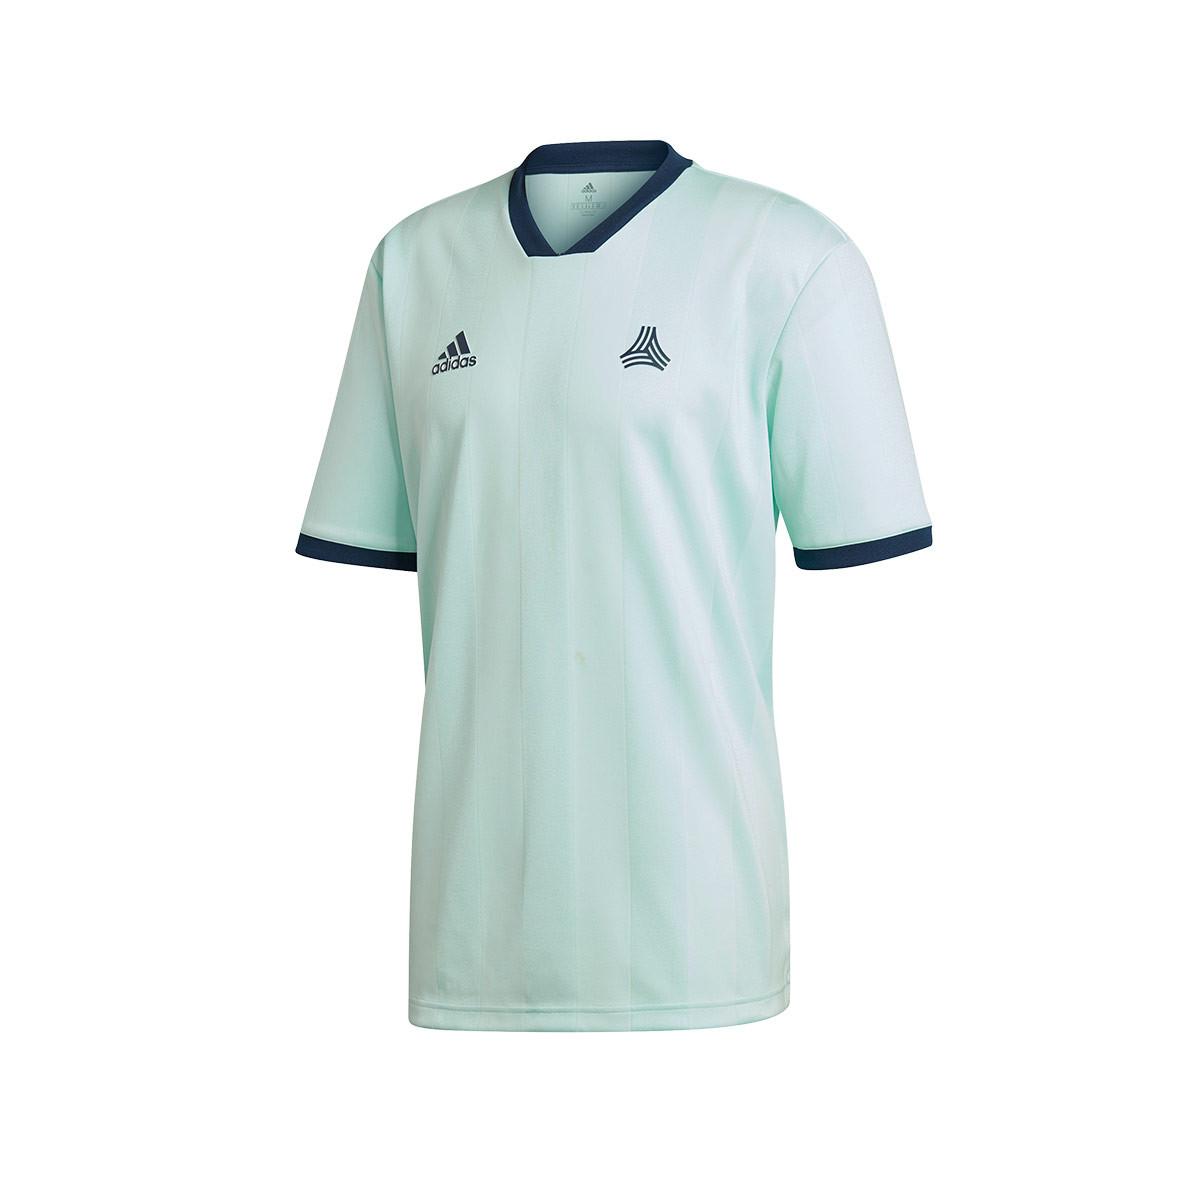 Jersey adidas Tango ADV Clear mint - Fútbol Emotion